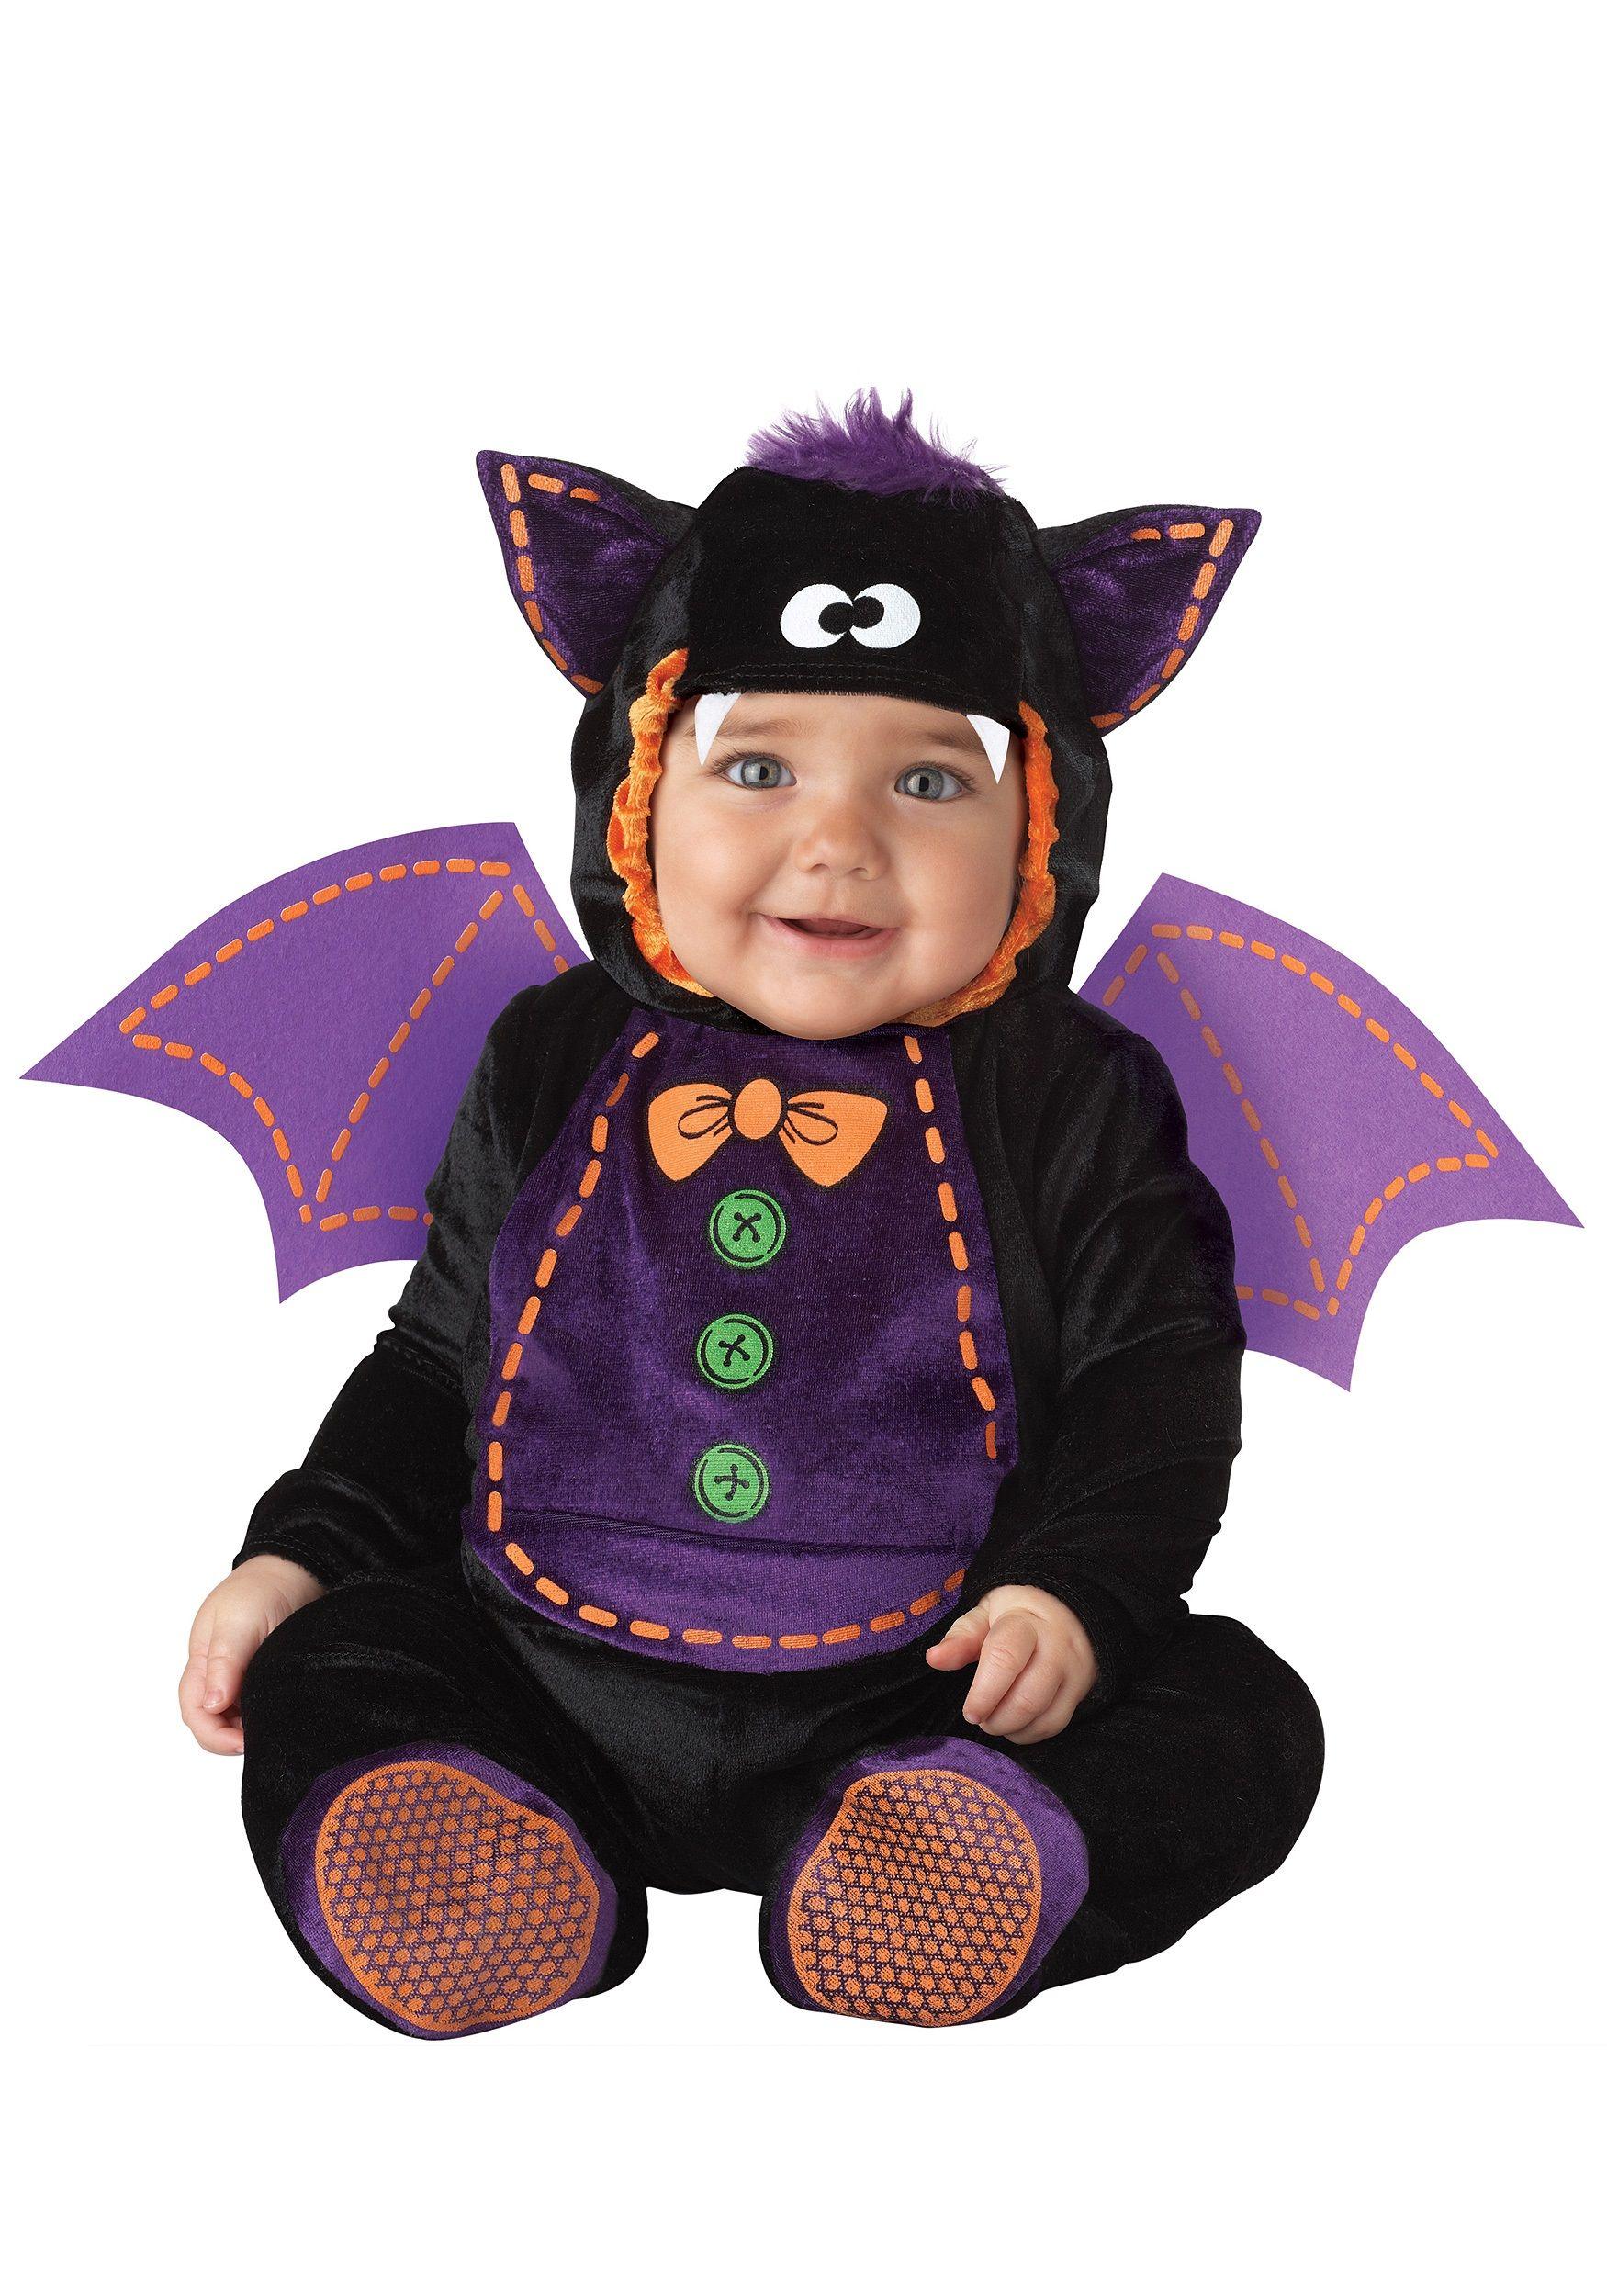 Infant Bat Costume | Halloween costume toddler, Toddler halloween ...